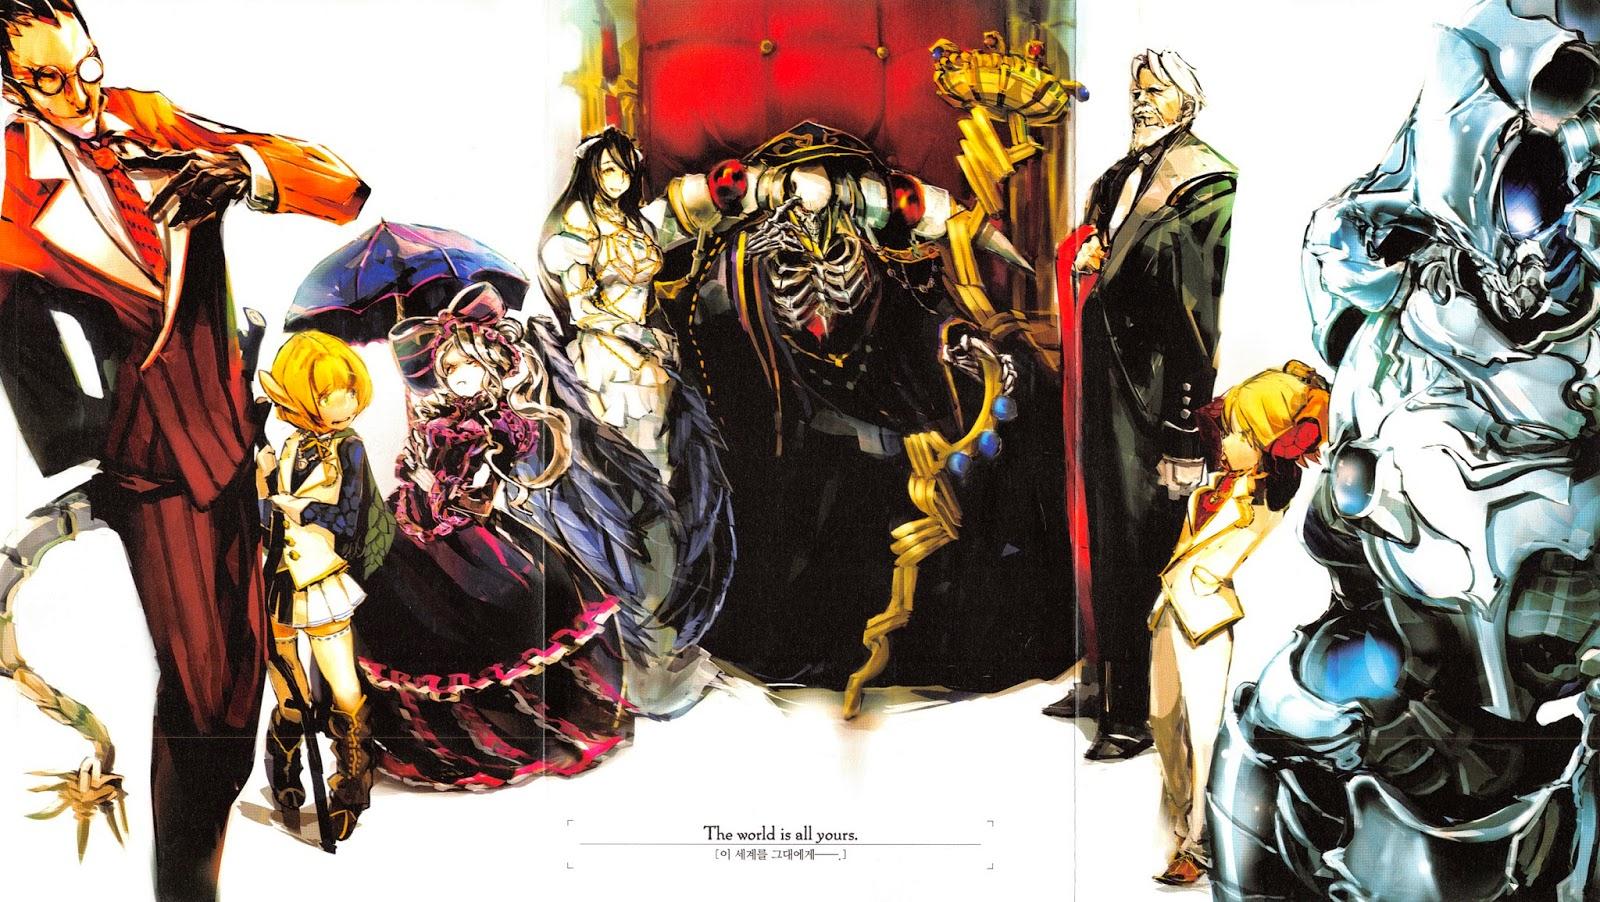 Anime 4k Wallpaper: Imoutolicious Light Novel Translations: Overlord Volume 1